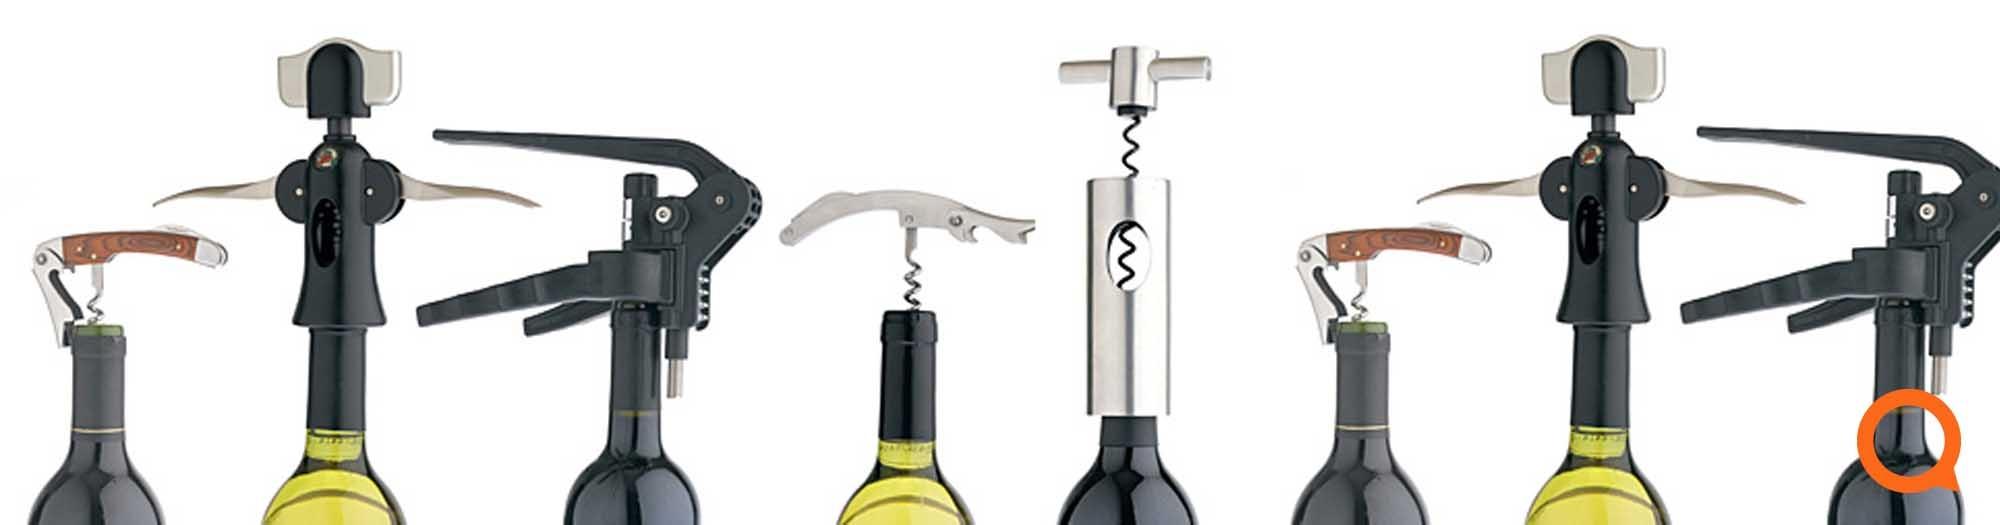 Wijn / Champagne accessoires